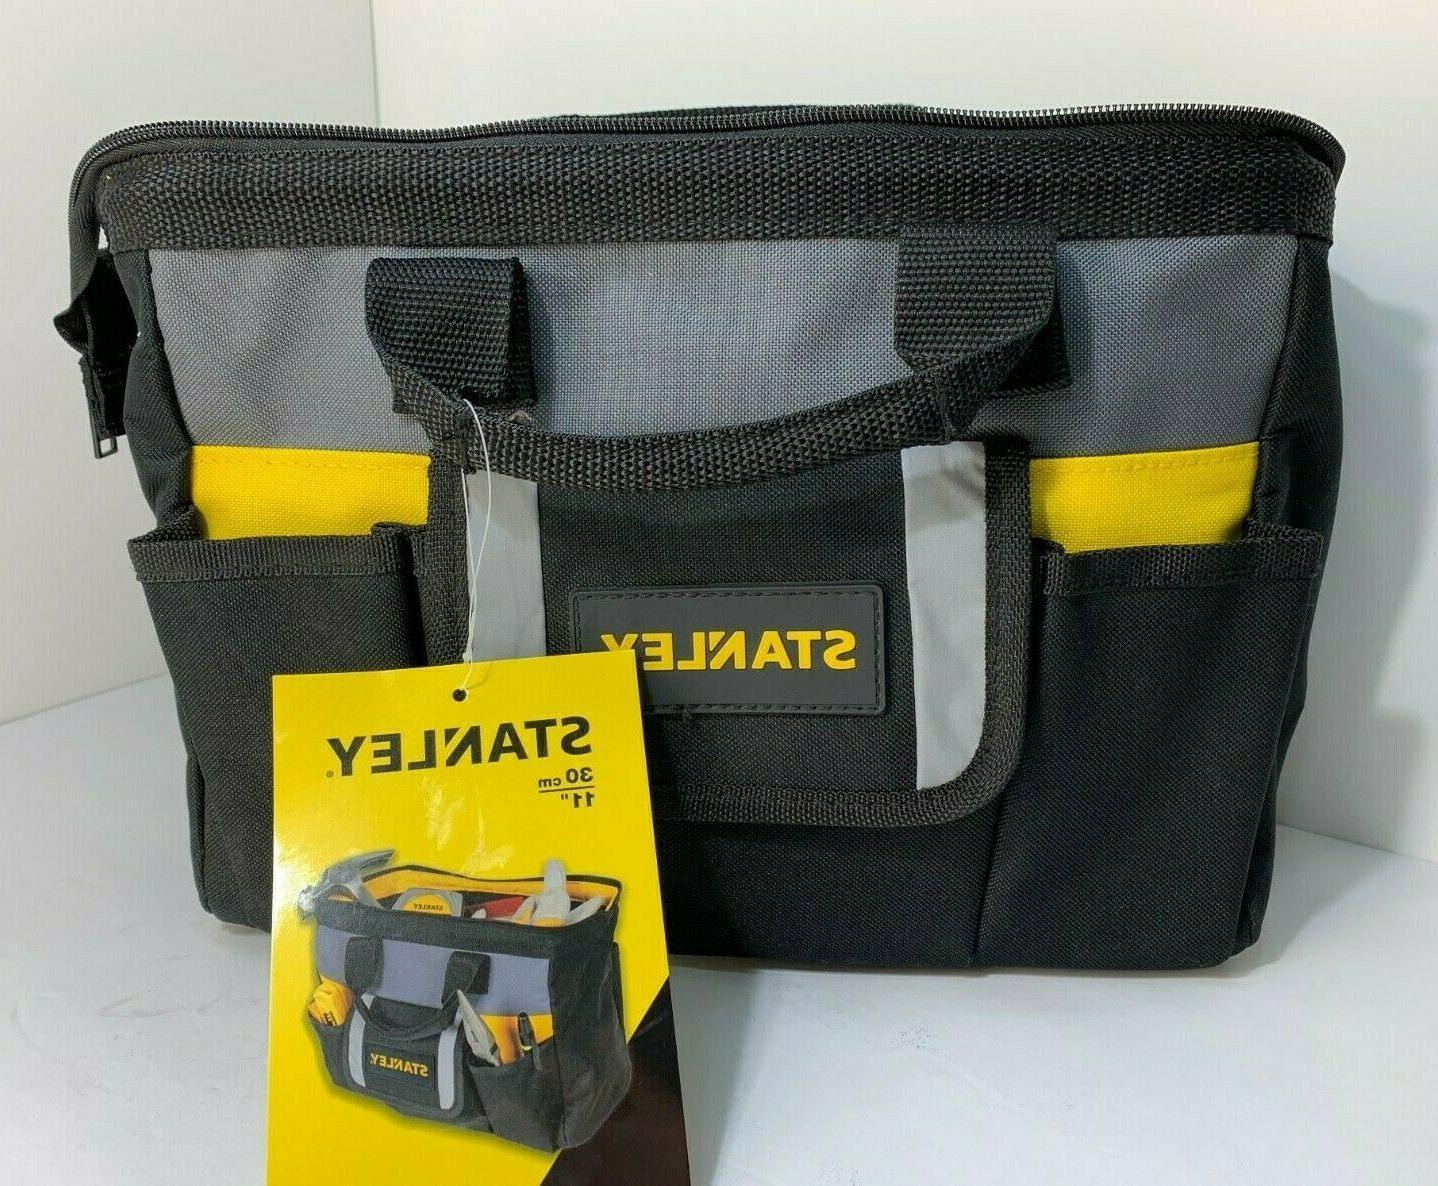 tool bag stst70574 11 9 x 5